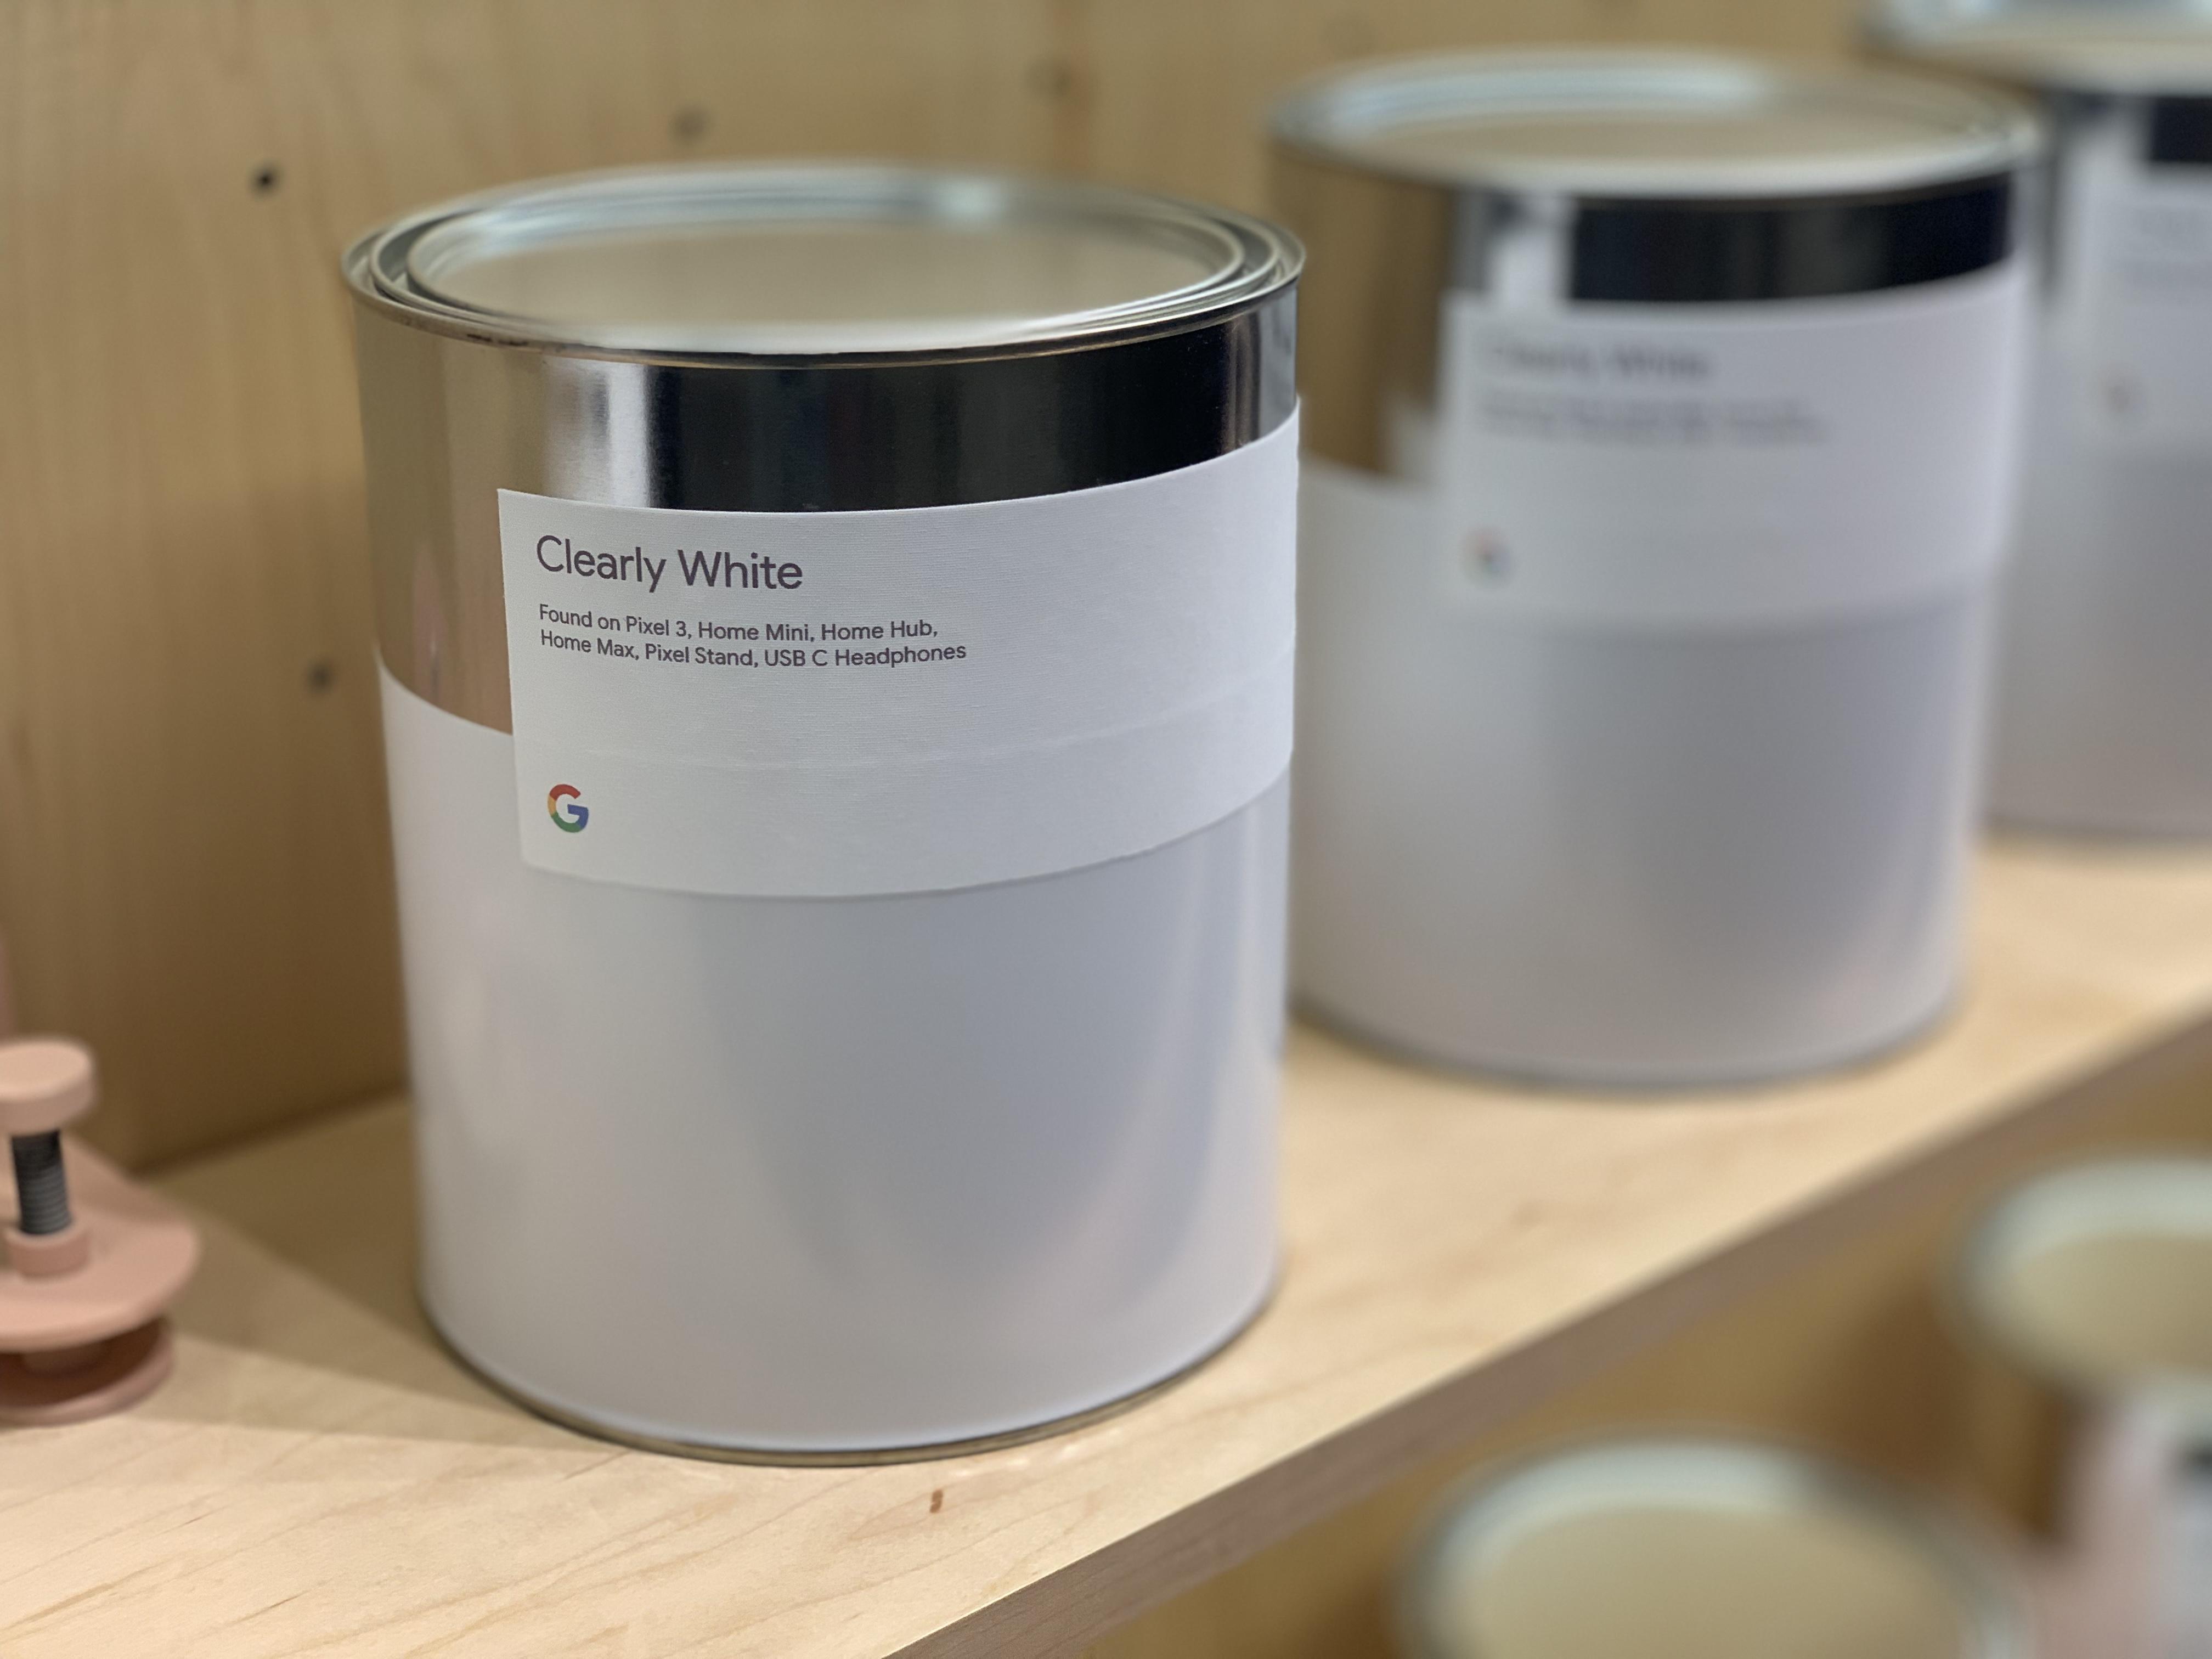 Google Hardware Store pop-up in SoHo New York [Gallery